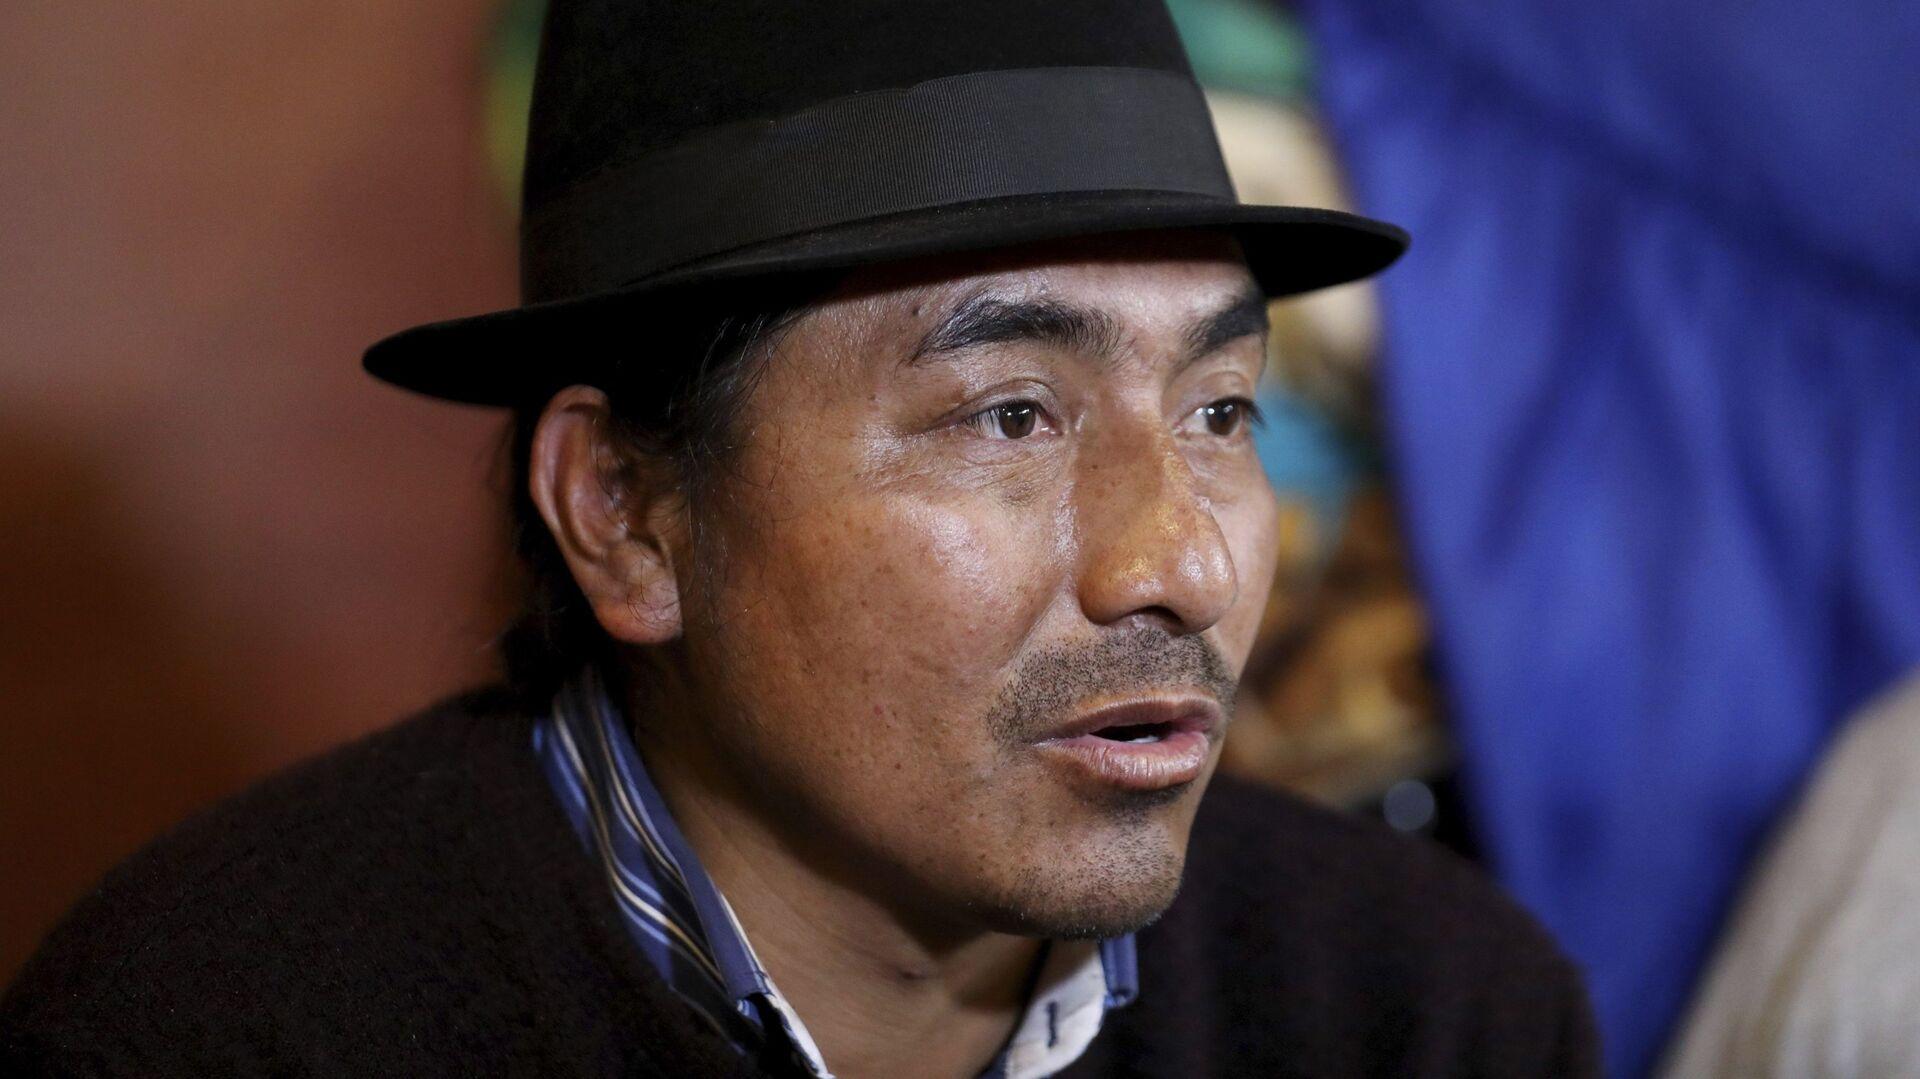 Leonidas Iza, dirigente indígena de Ecuador - Sputnik Mundo, 1920, 05.10.2021